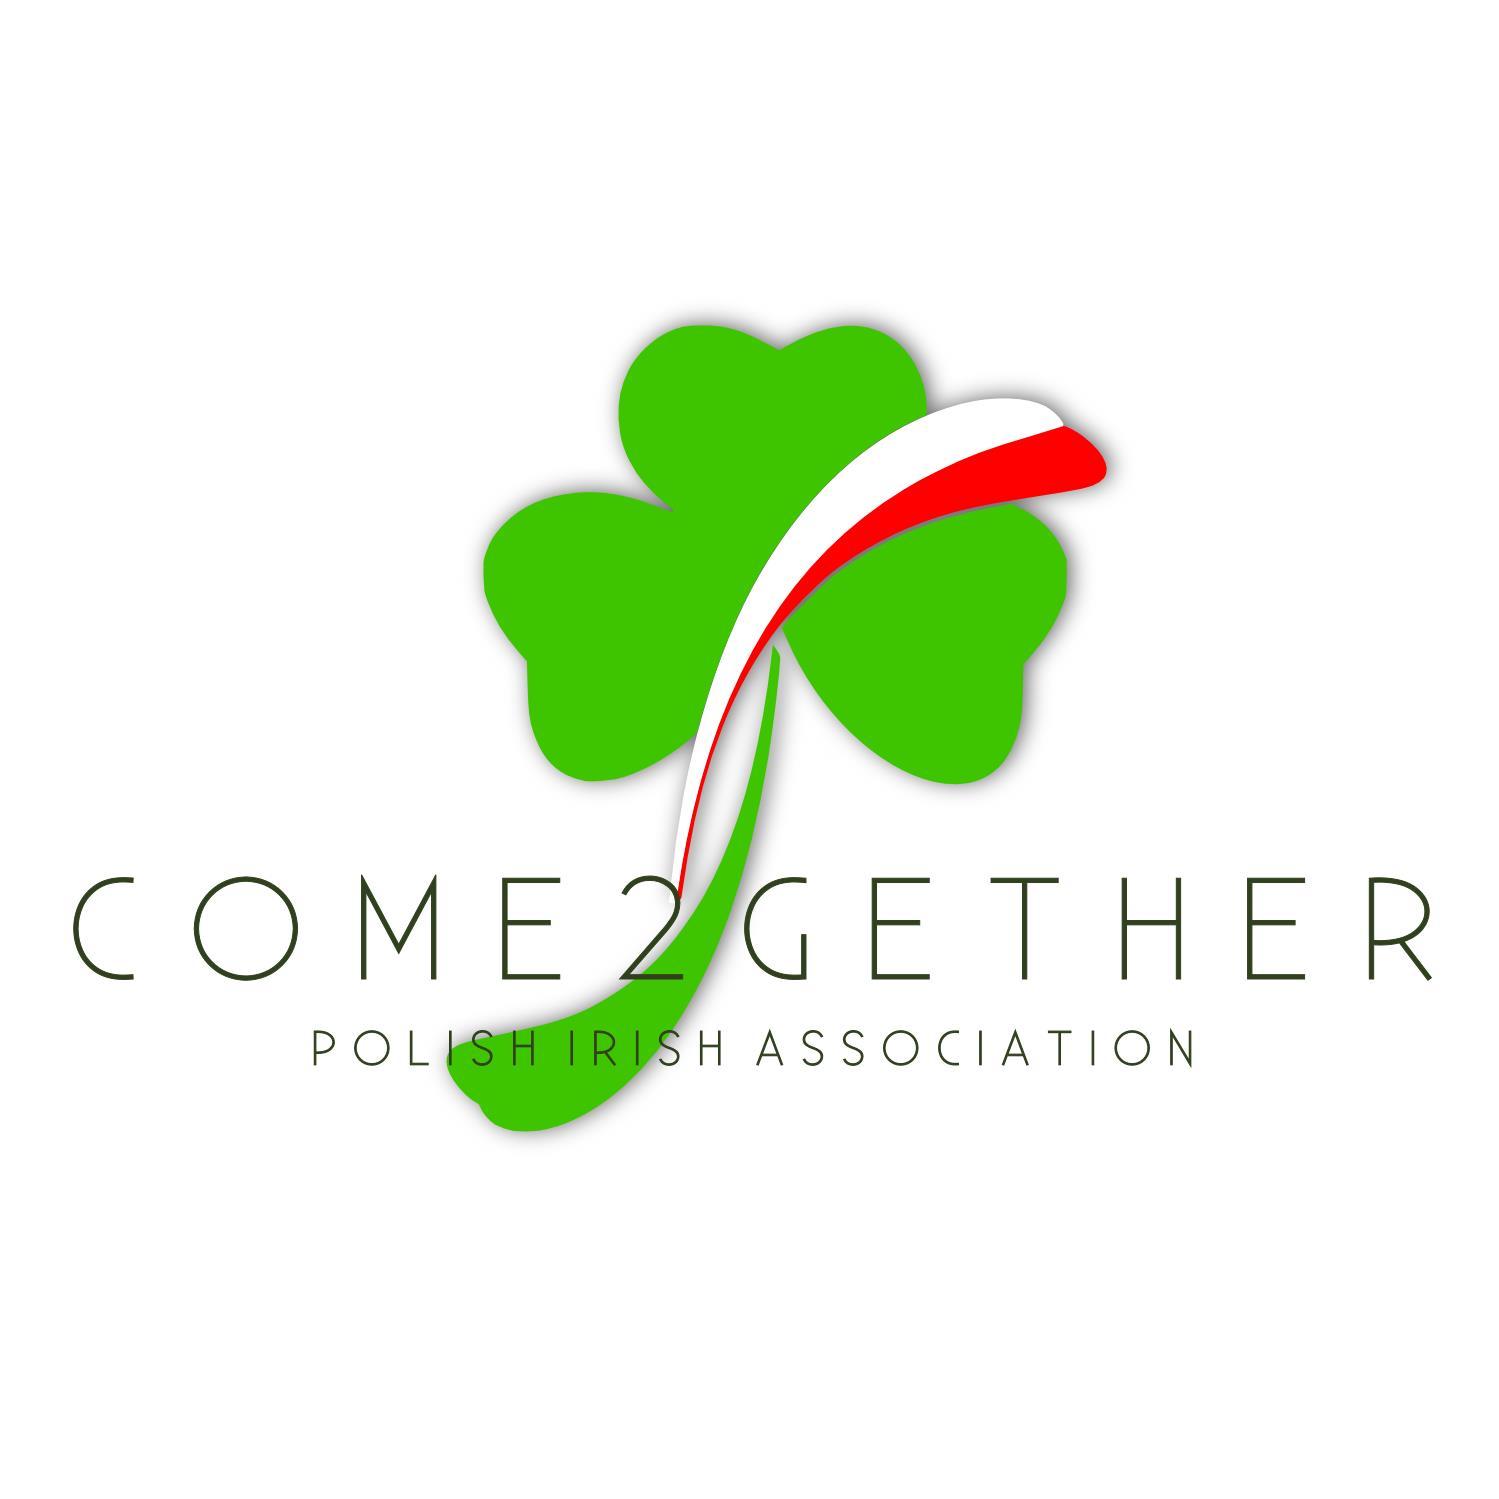 Polish-Irish Society Come2Gether